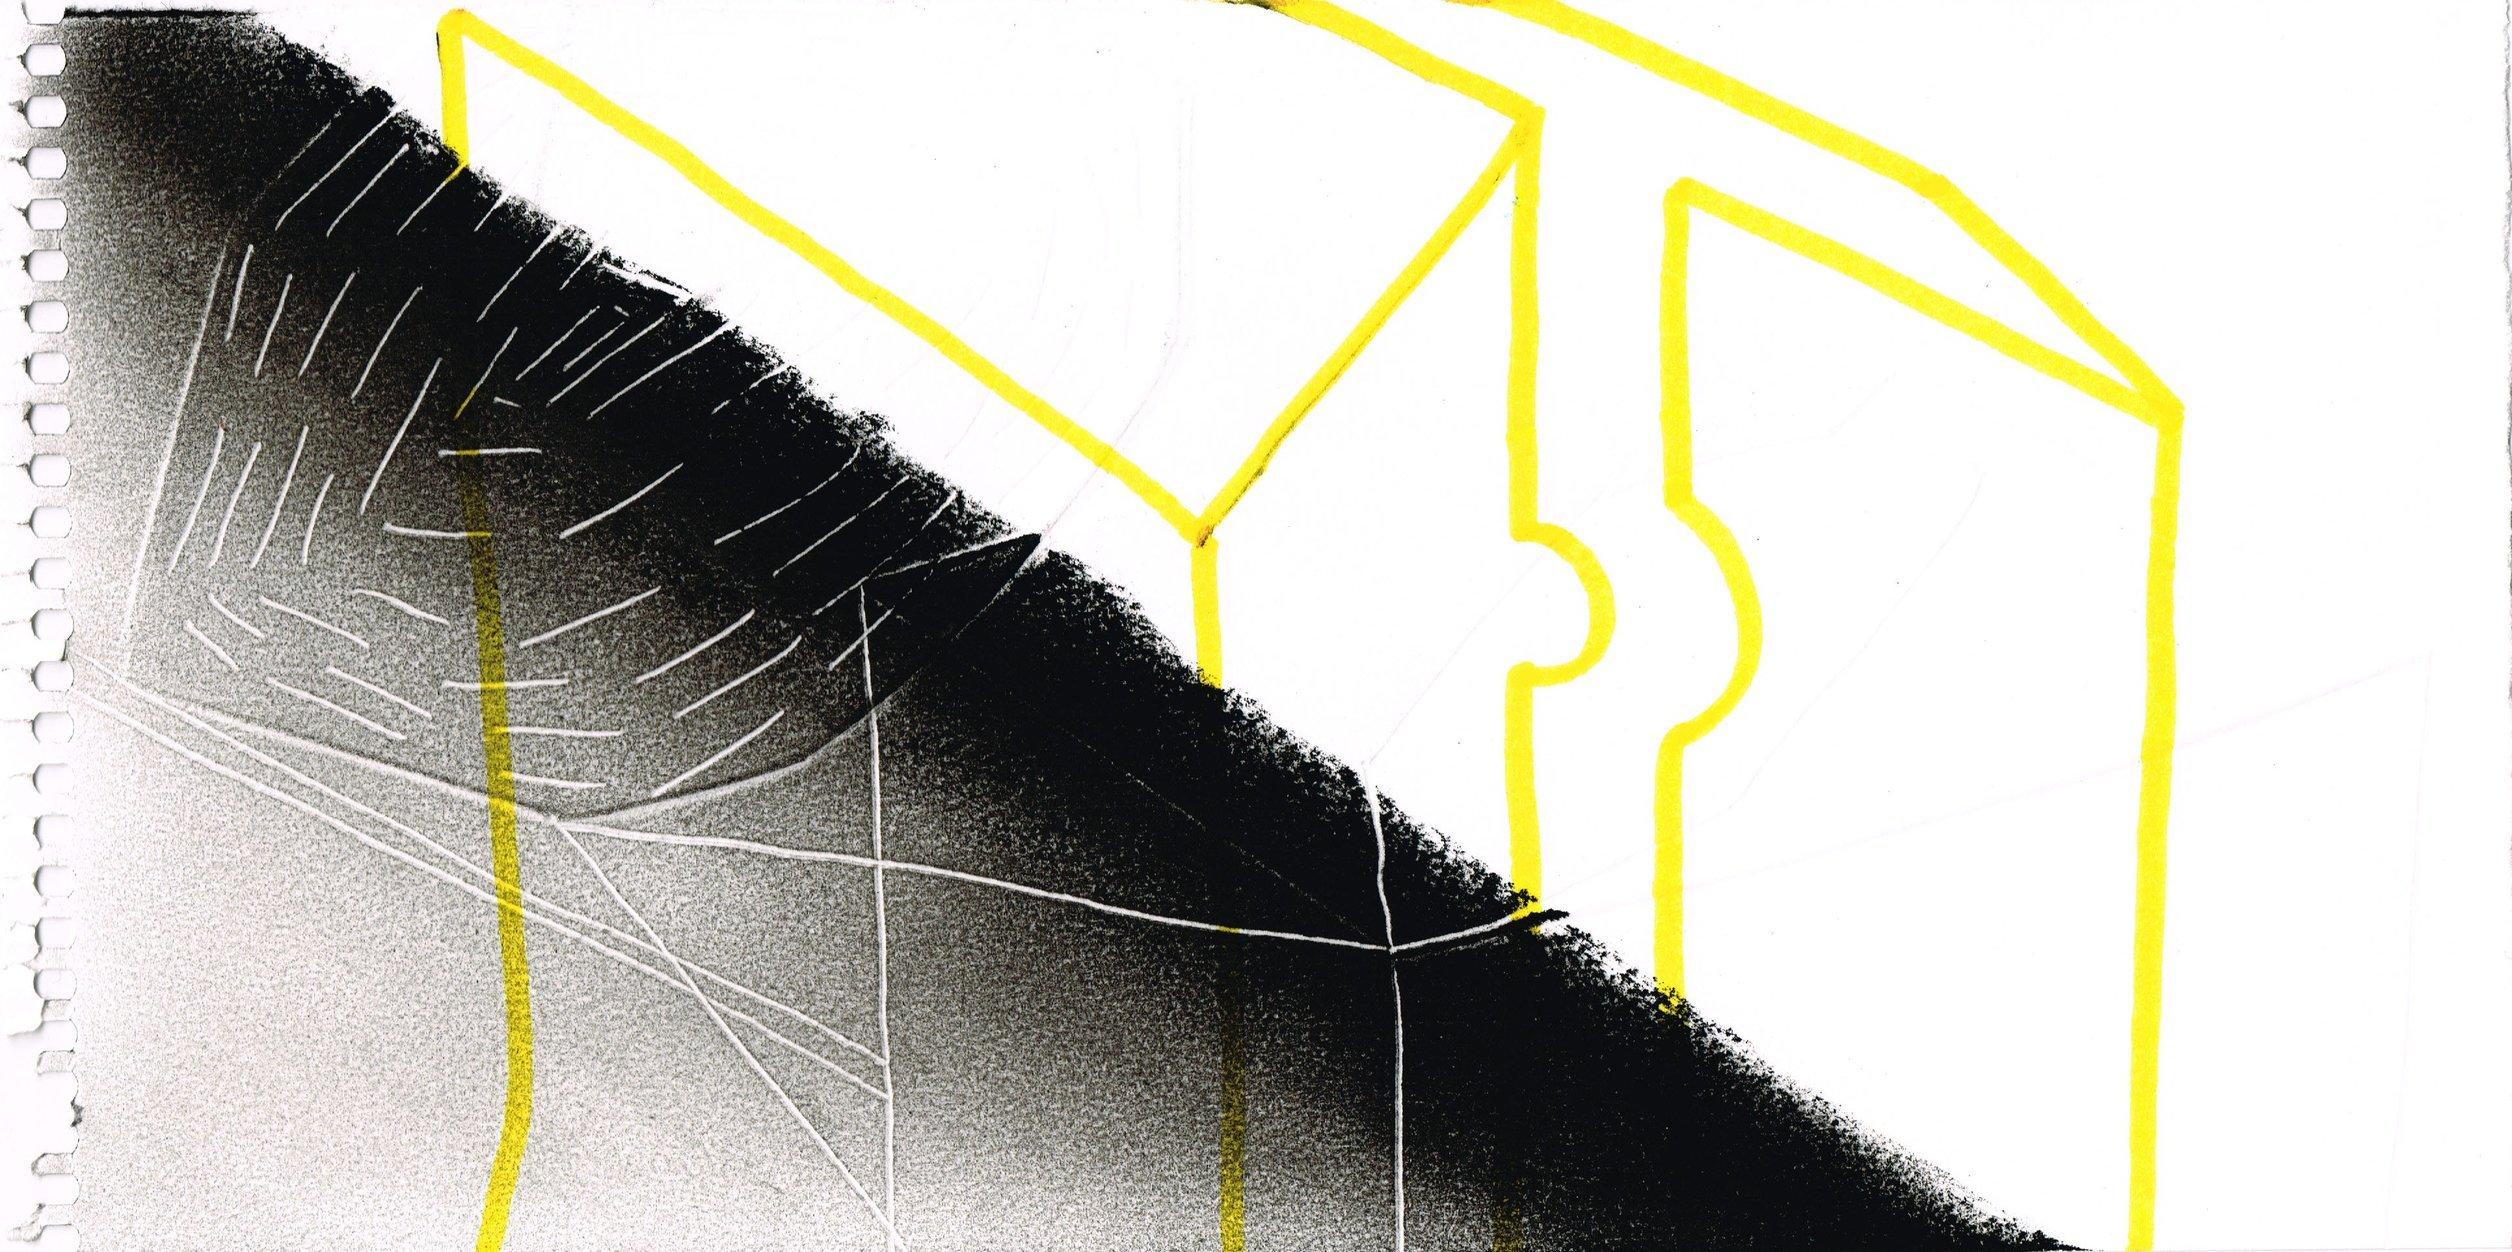 Zonder Titel, 2016, 12,7 x 23,7 cm